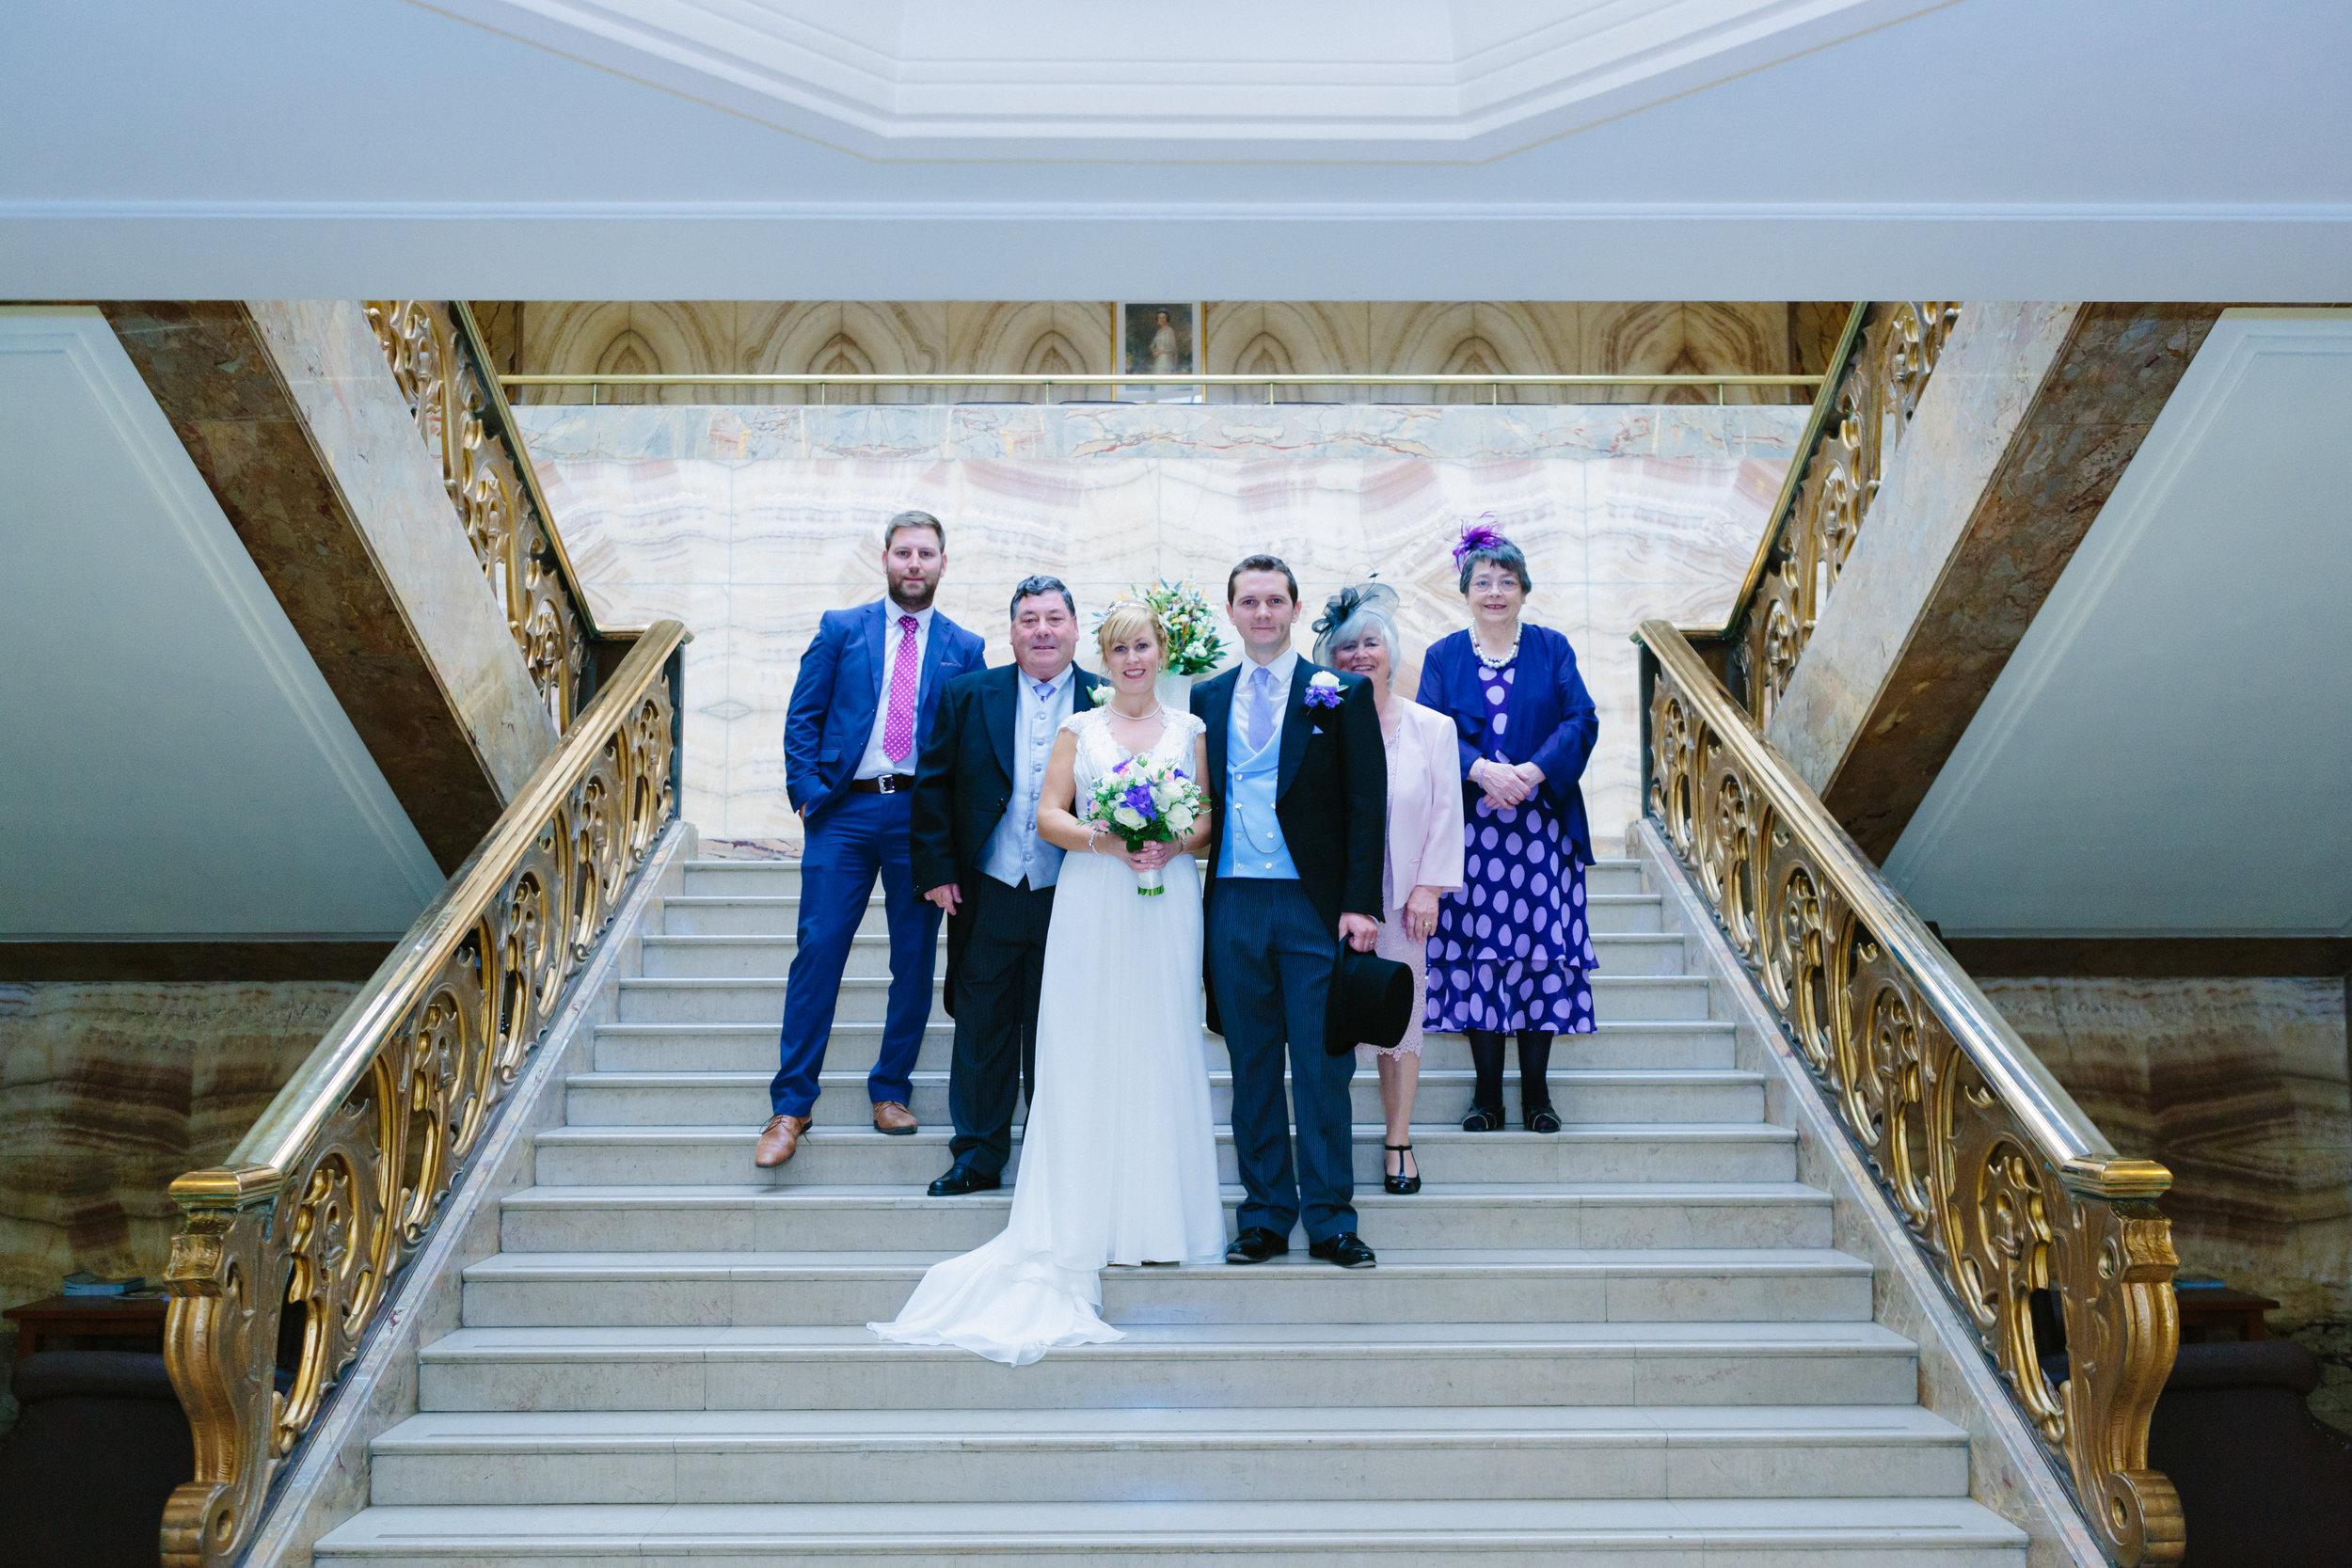 london-wedding-photography-wimbledon-wandsworth-town-hall-savoy-hotel-group-portrait-40